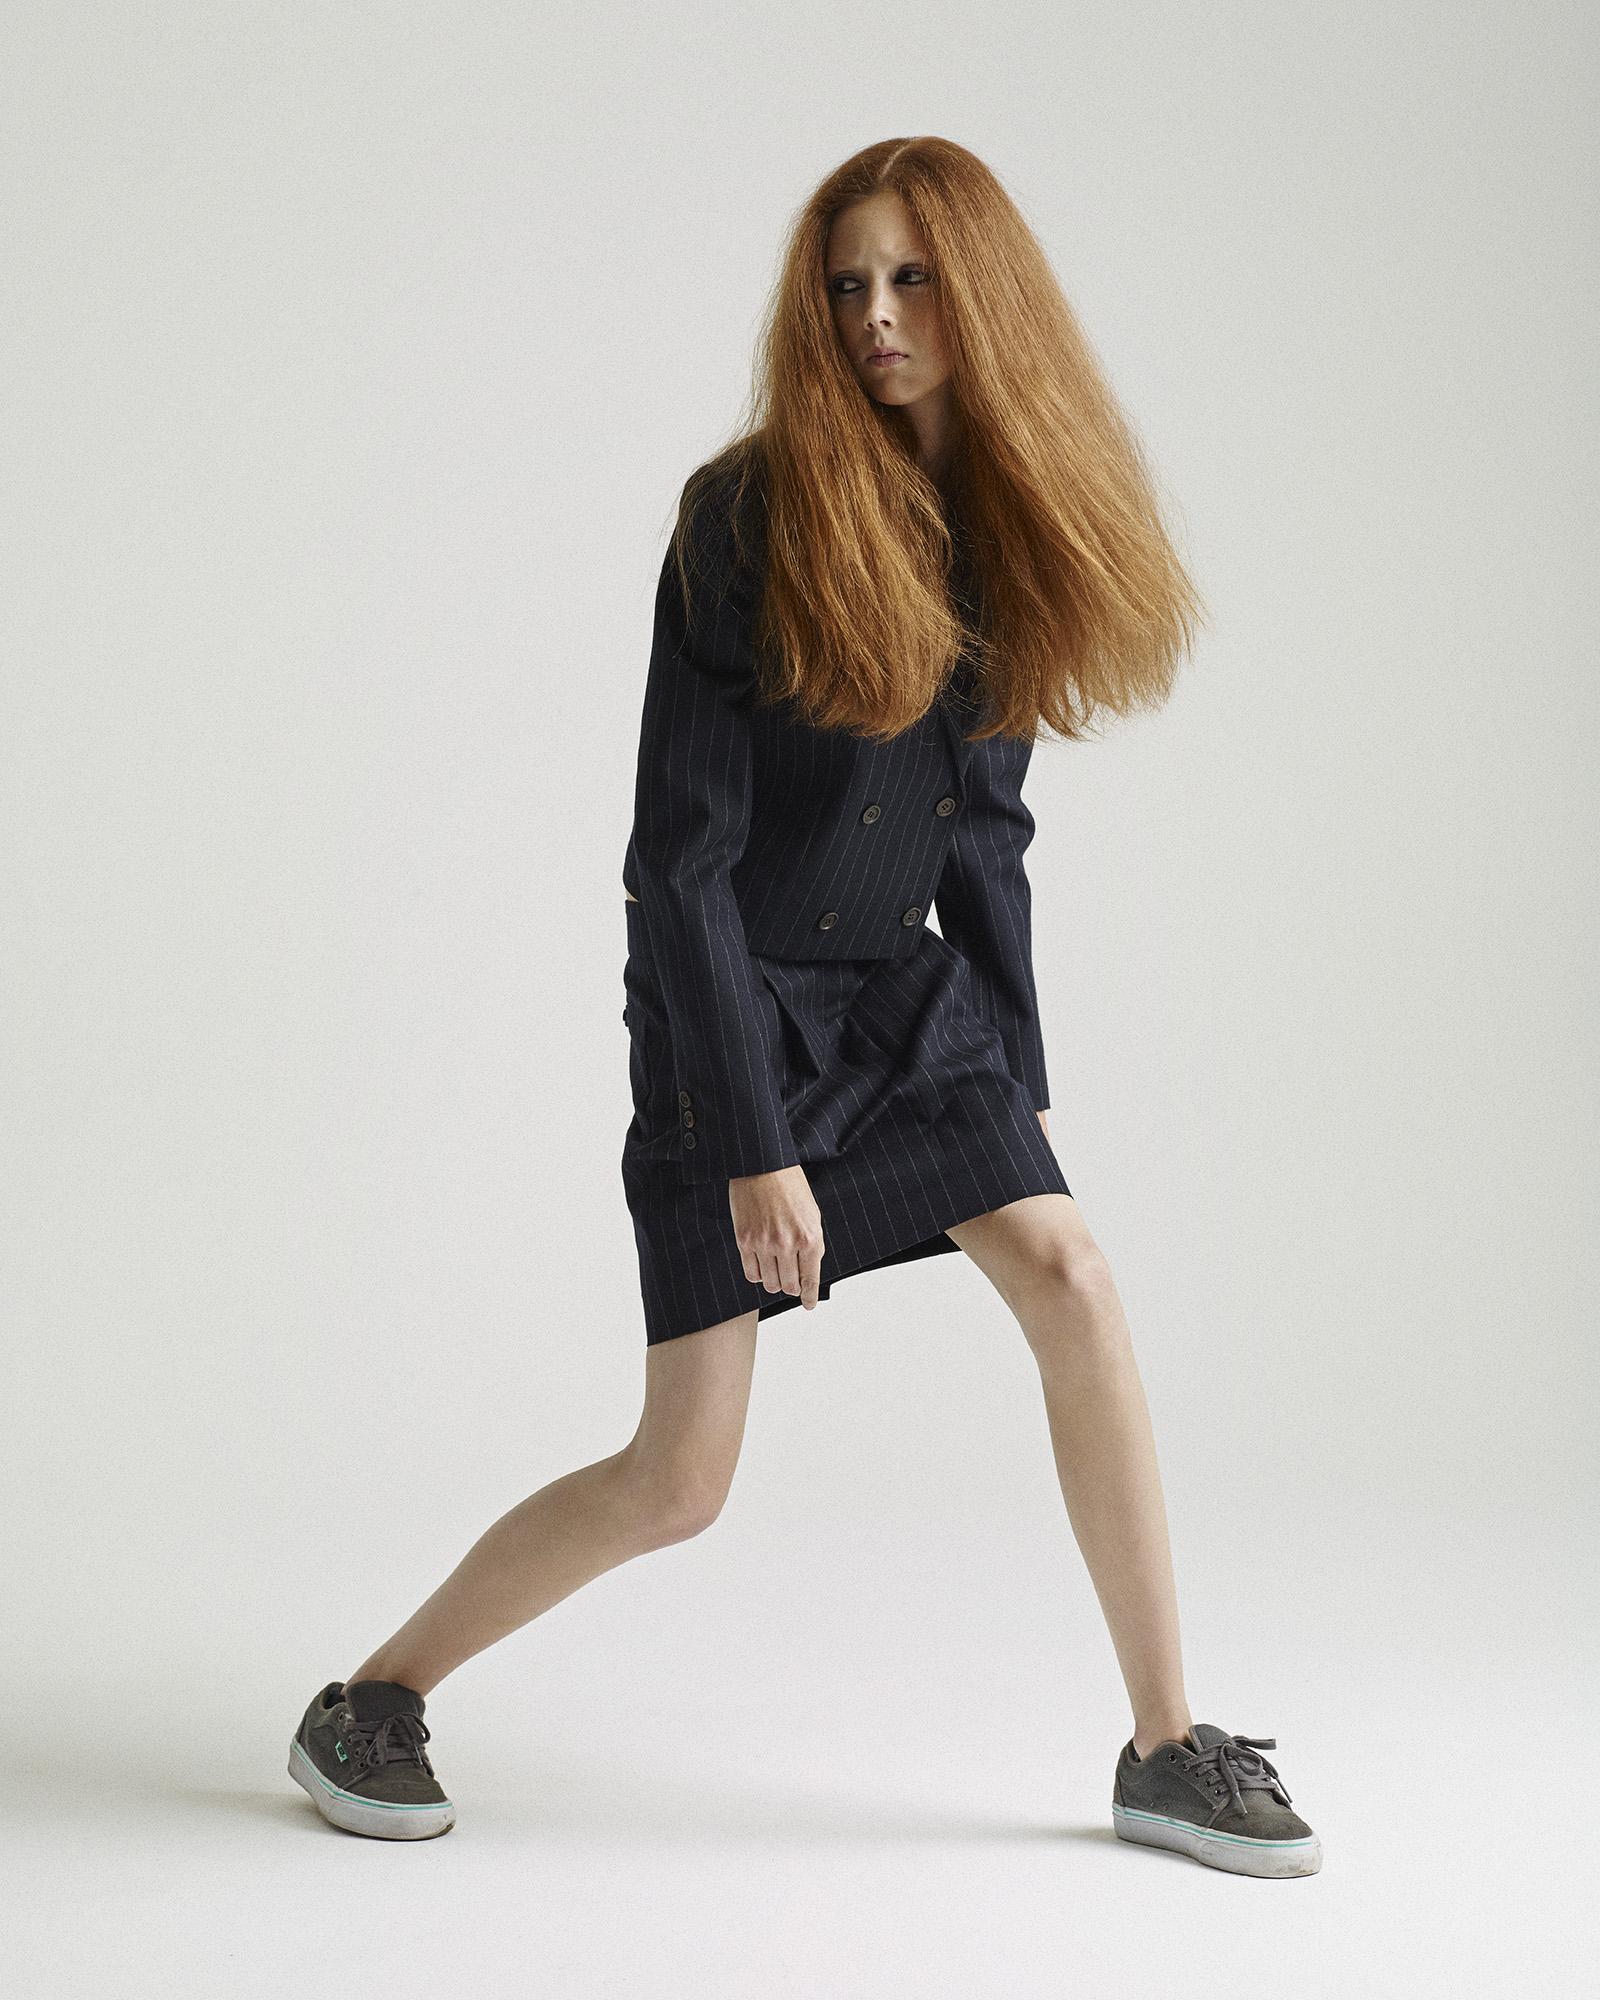 fashion_test_natalie16242 1.jpg